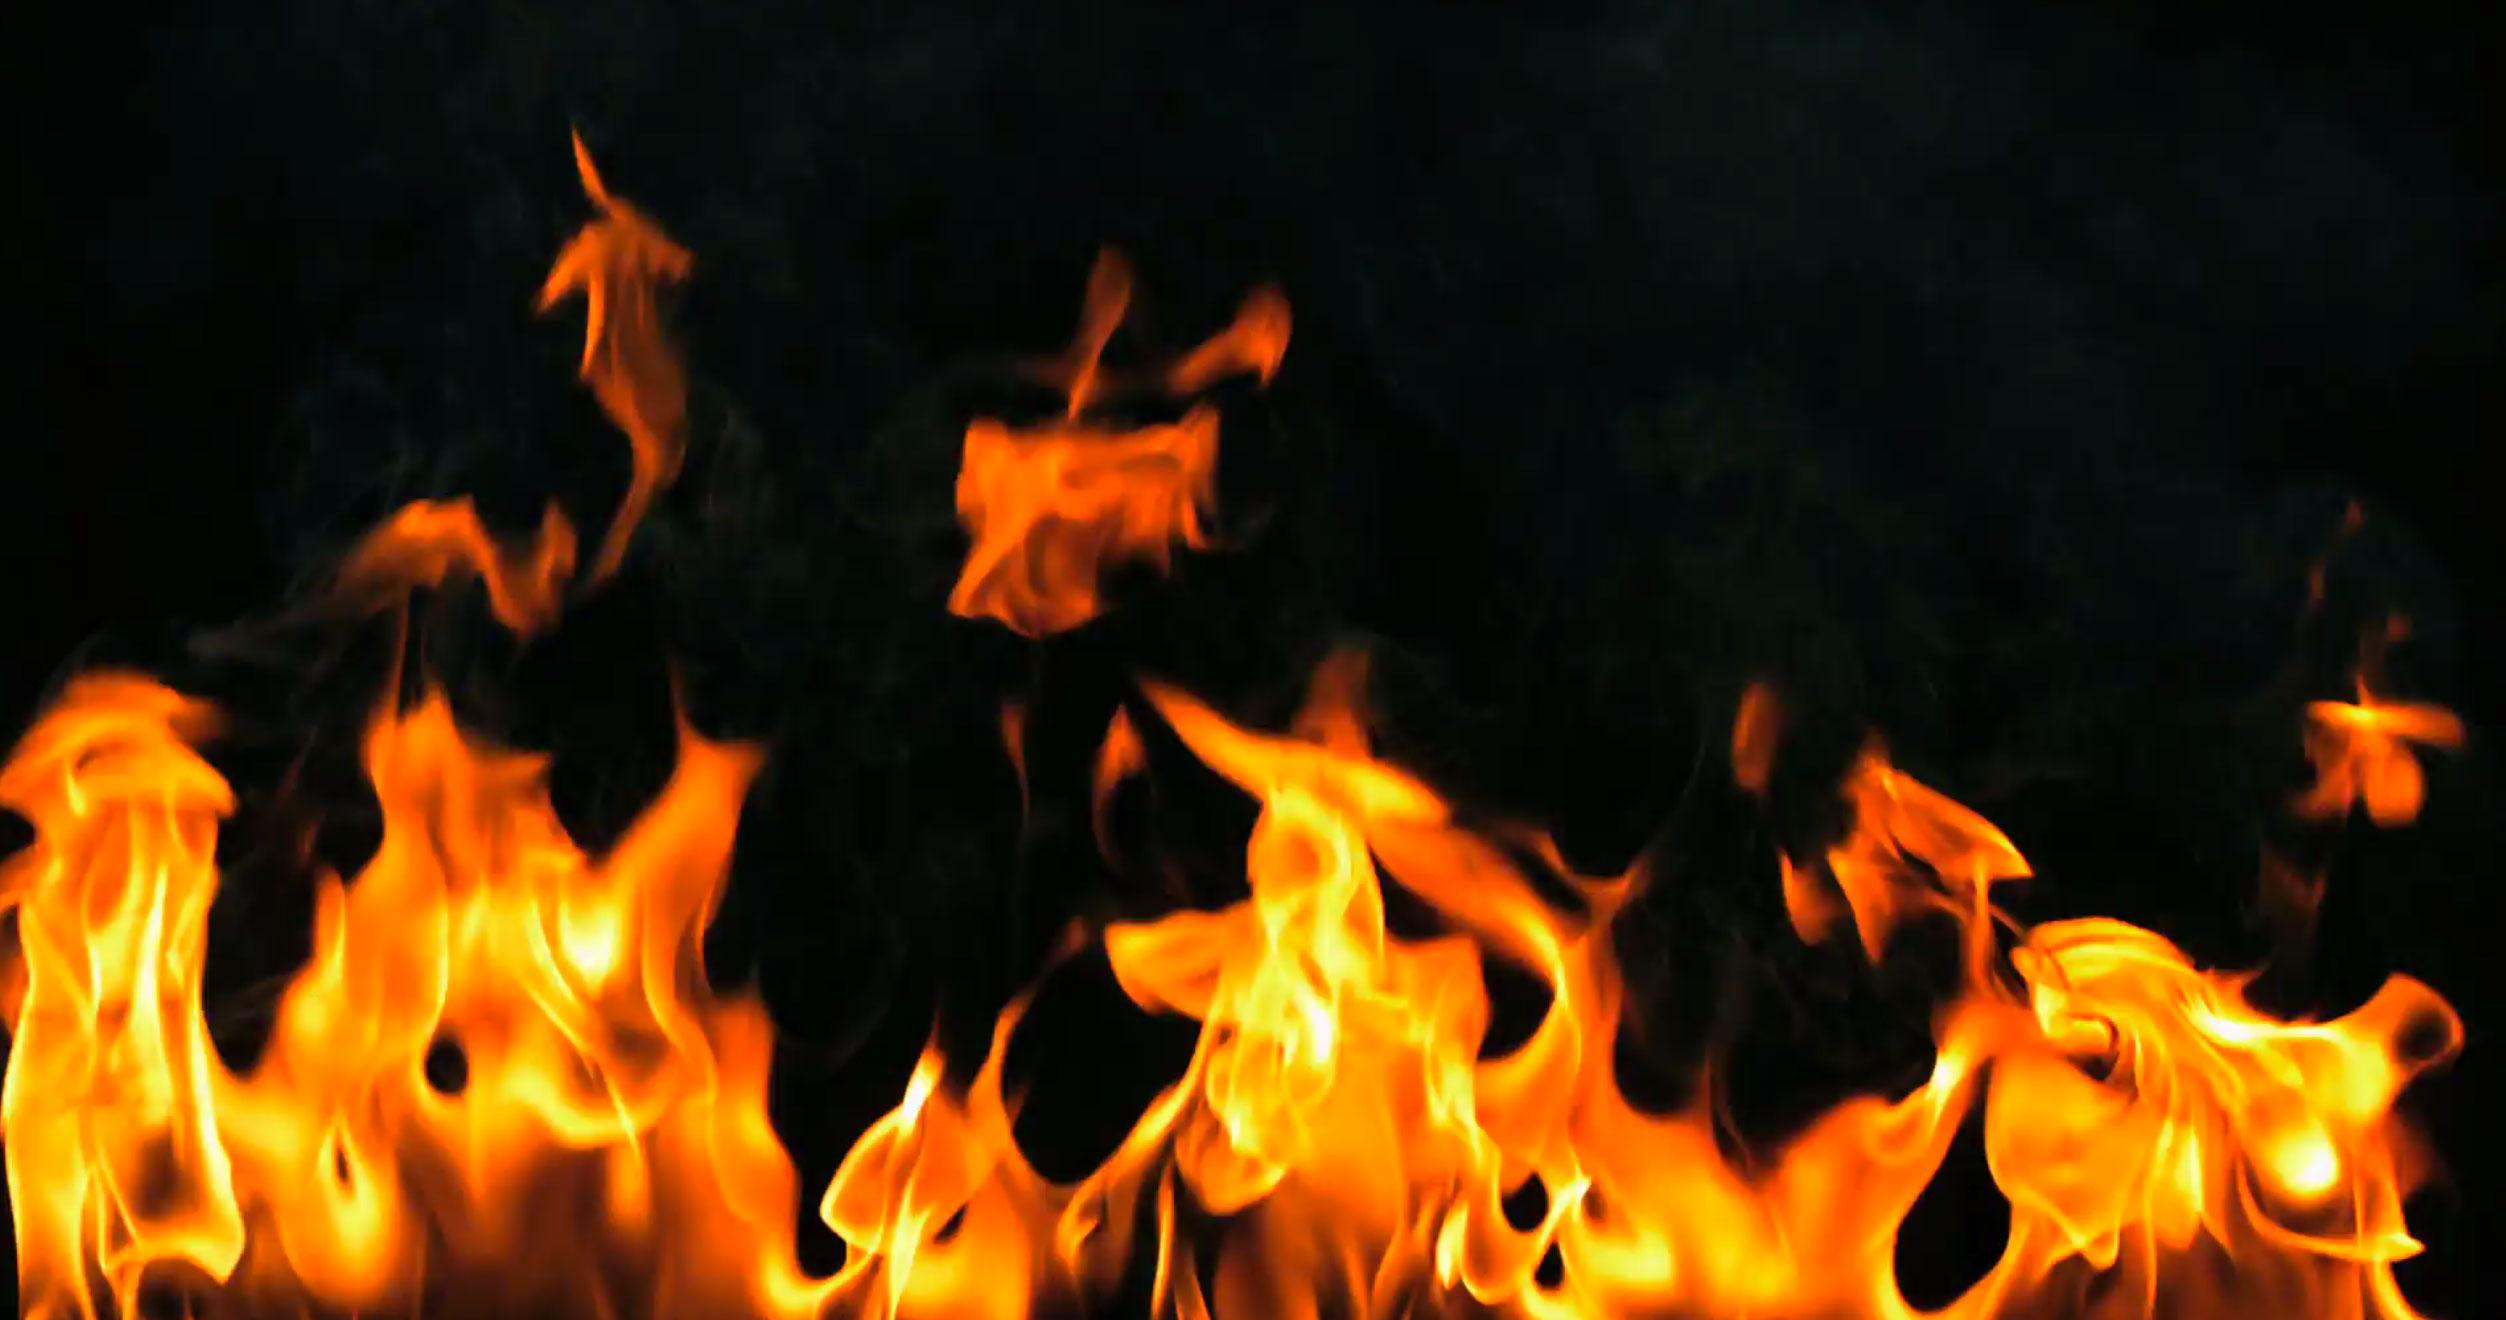 Sams Fire Hot Sauces UK